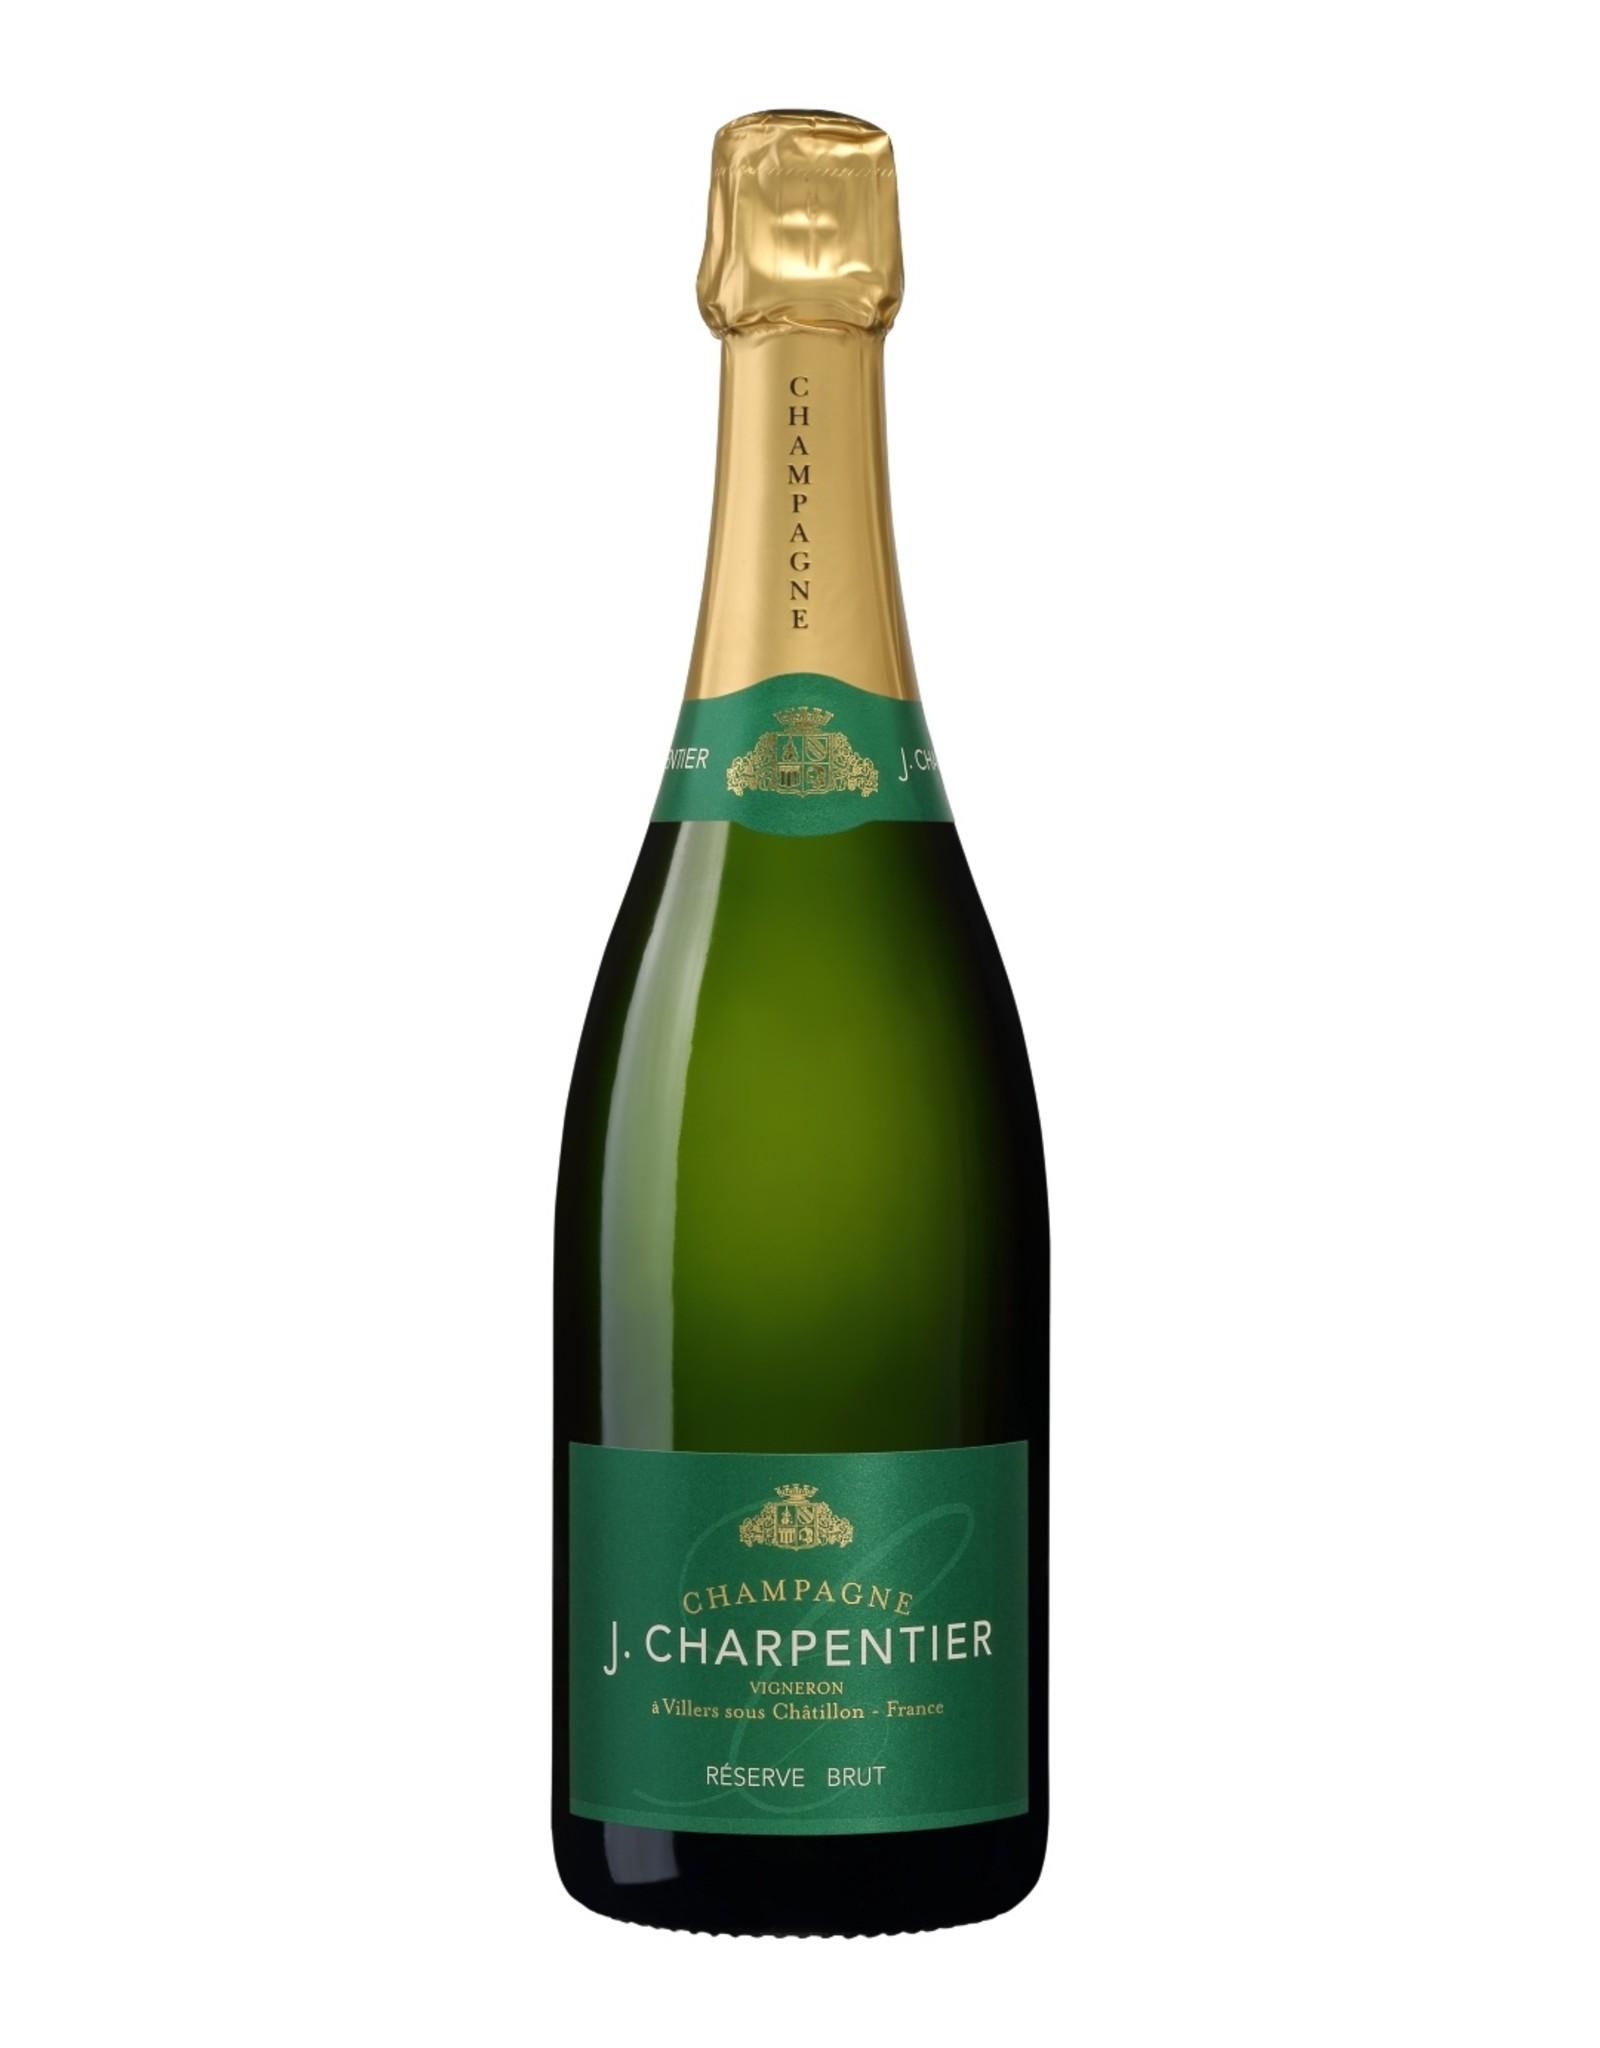 J. Charpentier Champagne J. Charpentier Reserve Brut